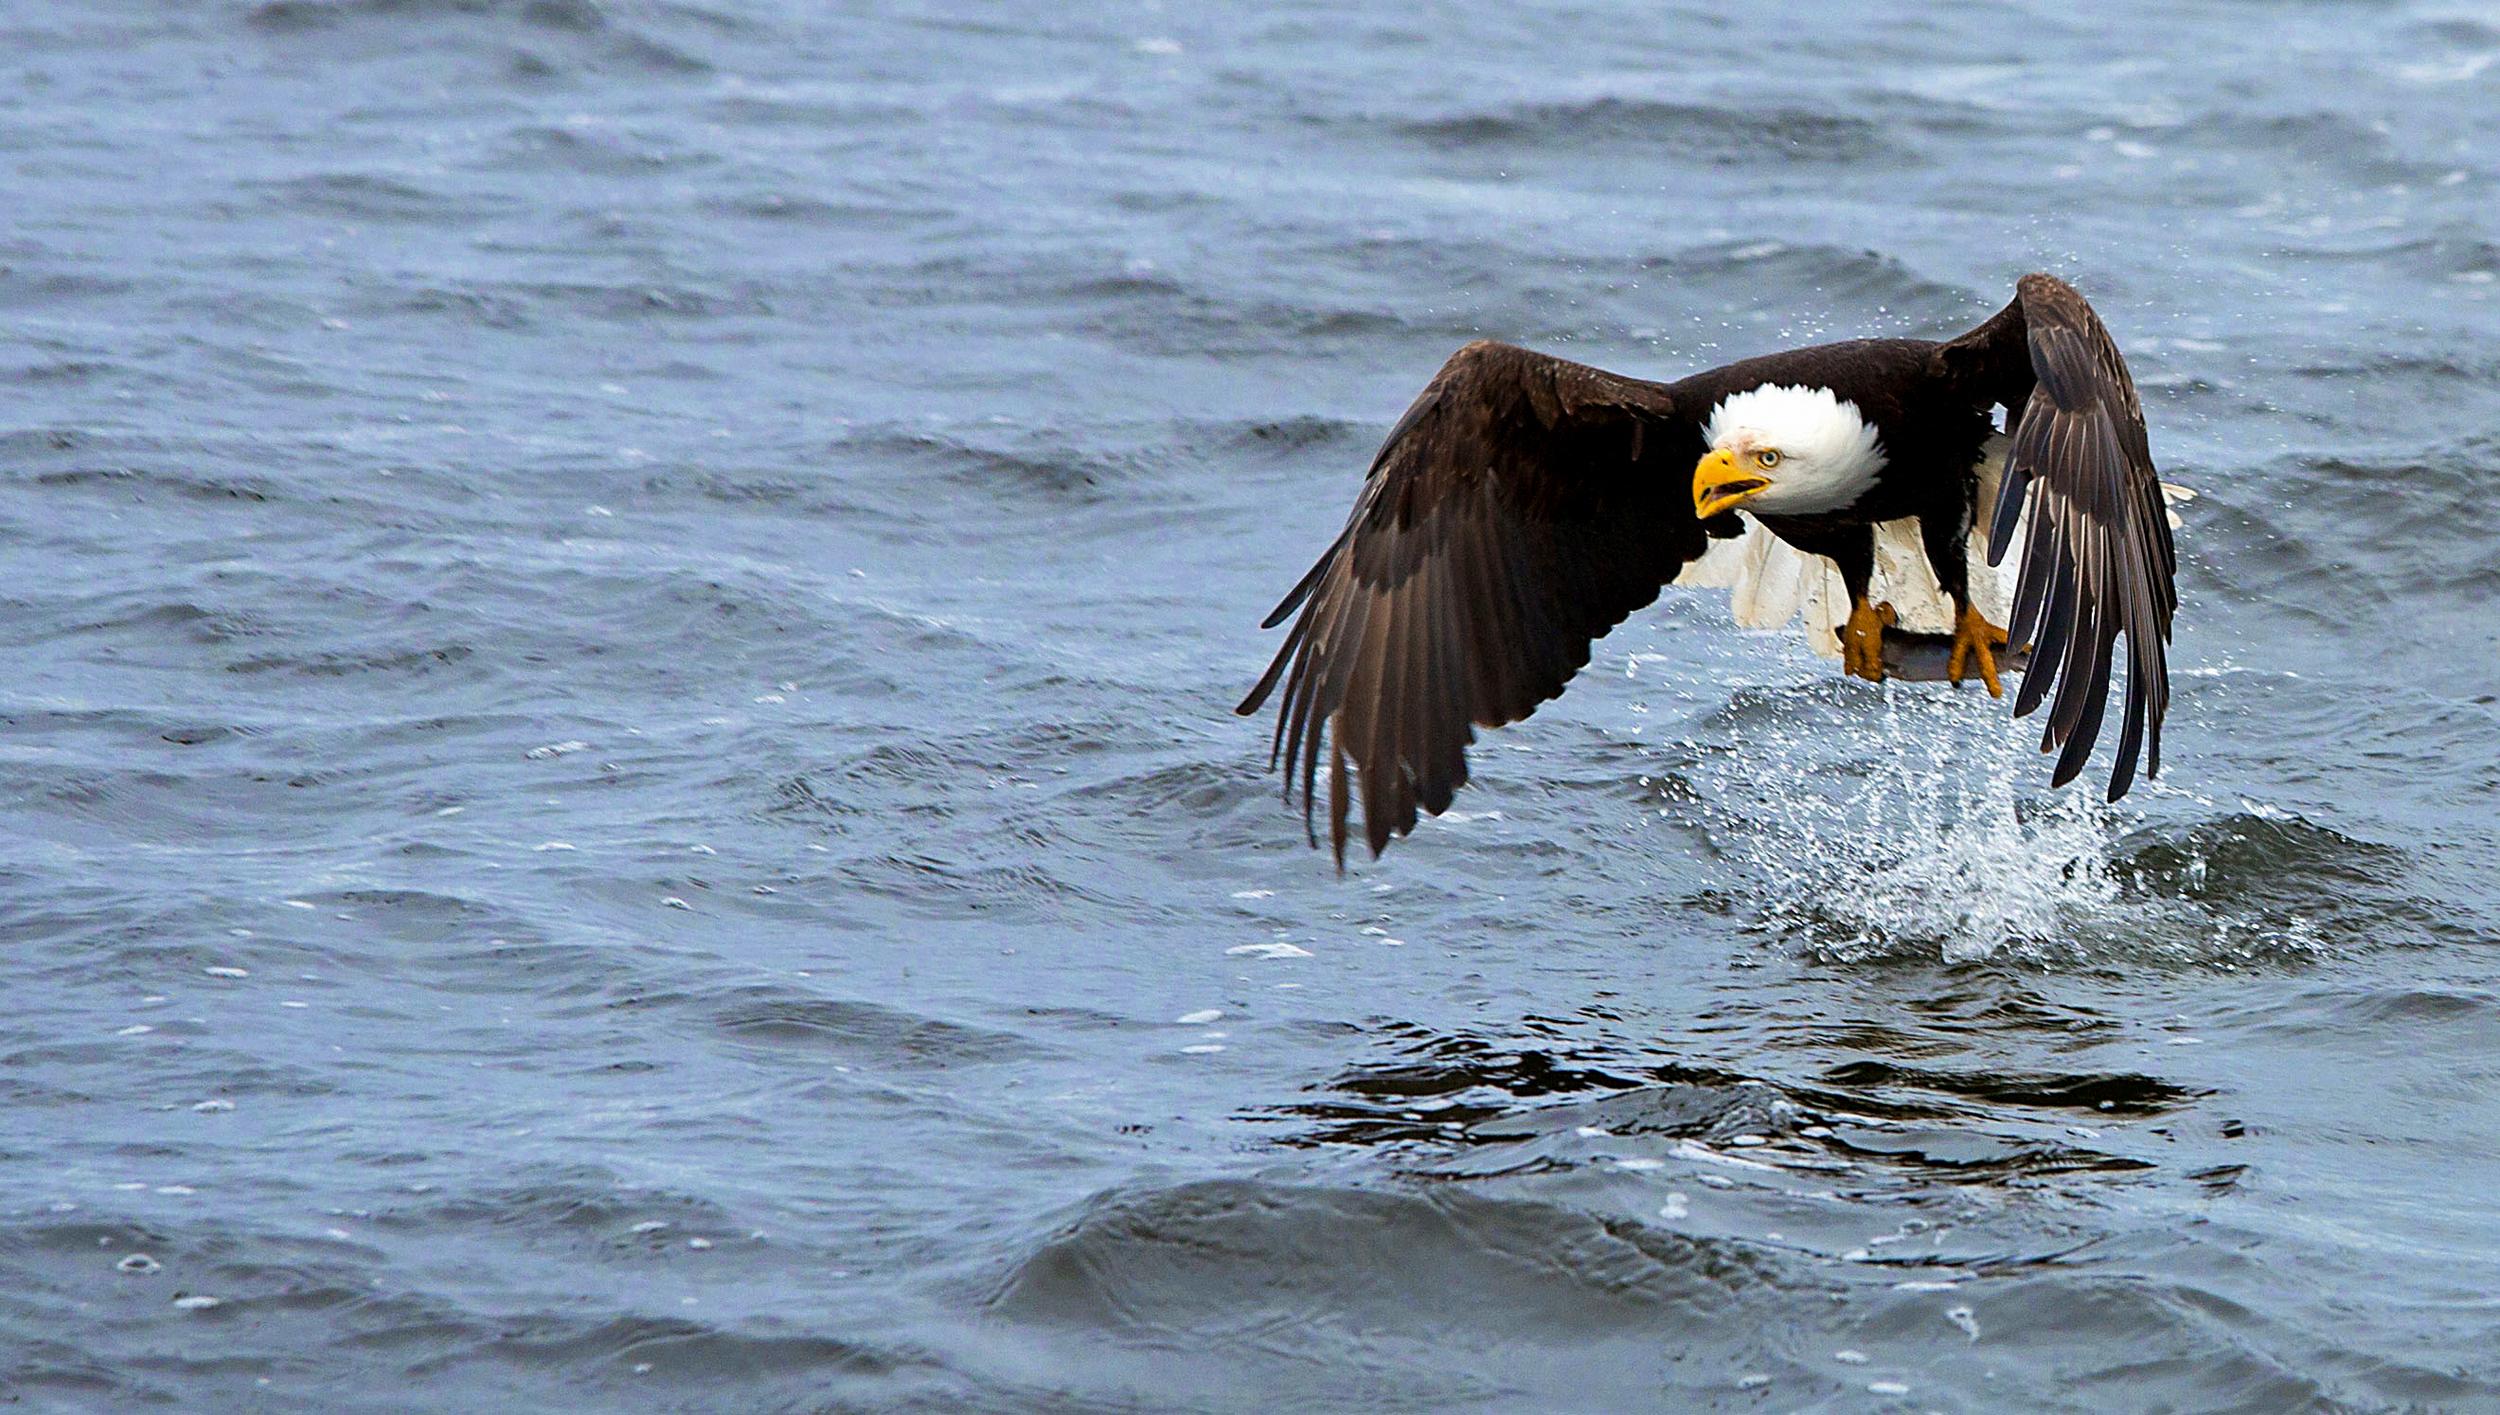 Rick Sammon's Birds016.jpg